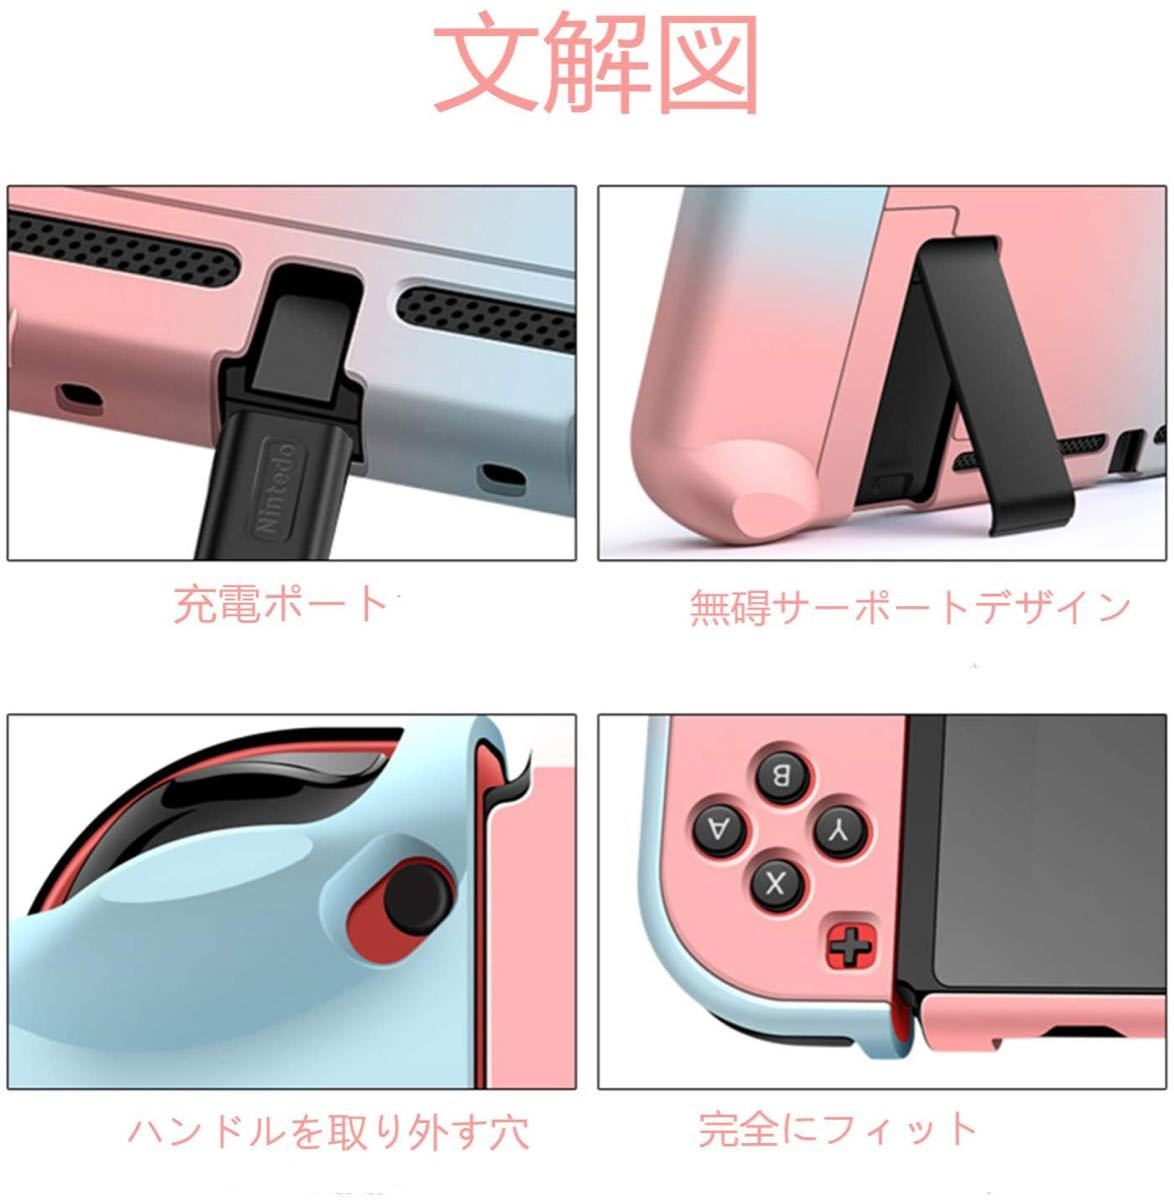 Nintendo switch カバー スイッチケース ピンク/ホワイト